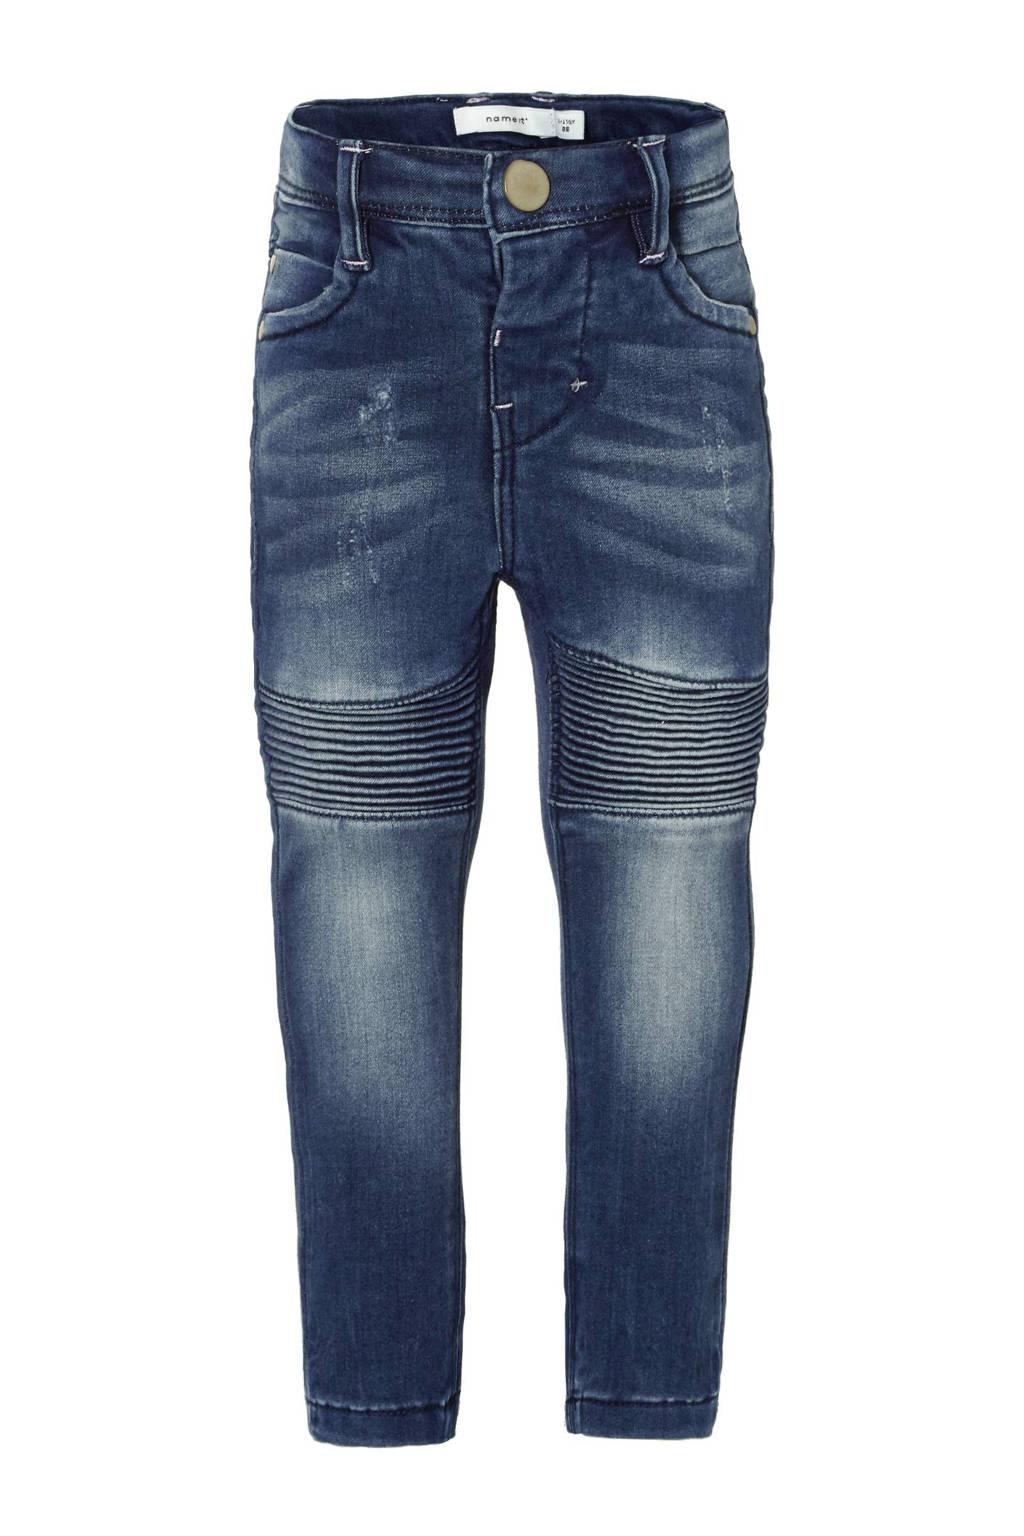 name it MINI Polly skinny fit jeans, Medium blue denim